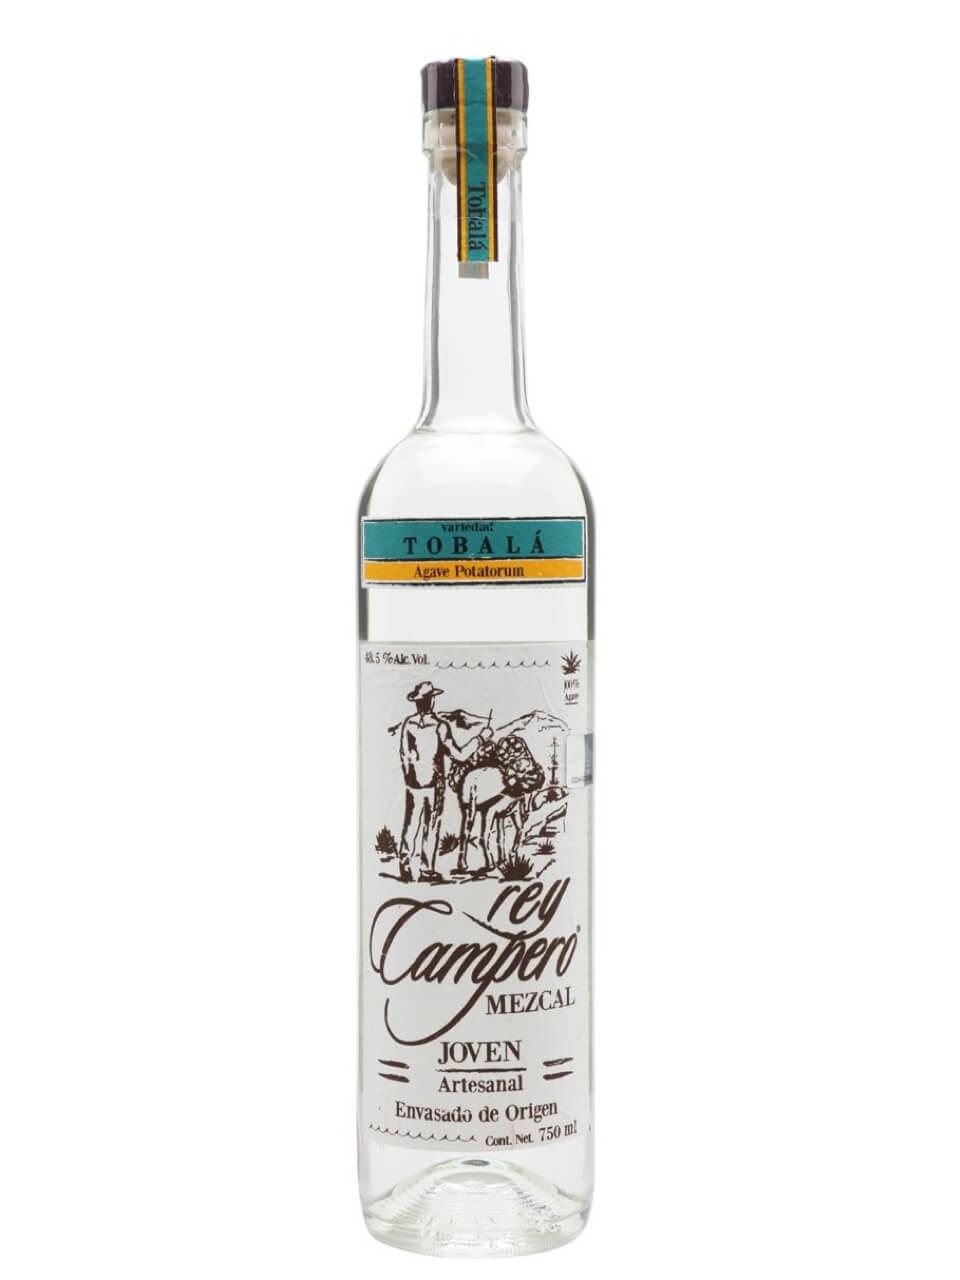 Rey Campero Tobala Joven Mezcal bottle